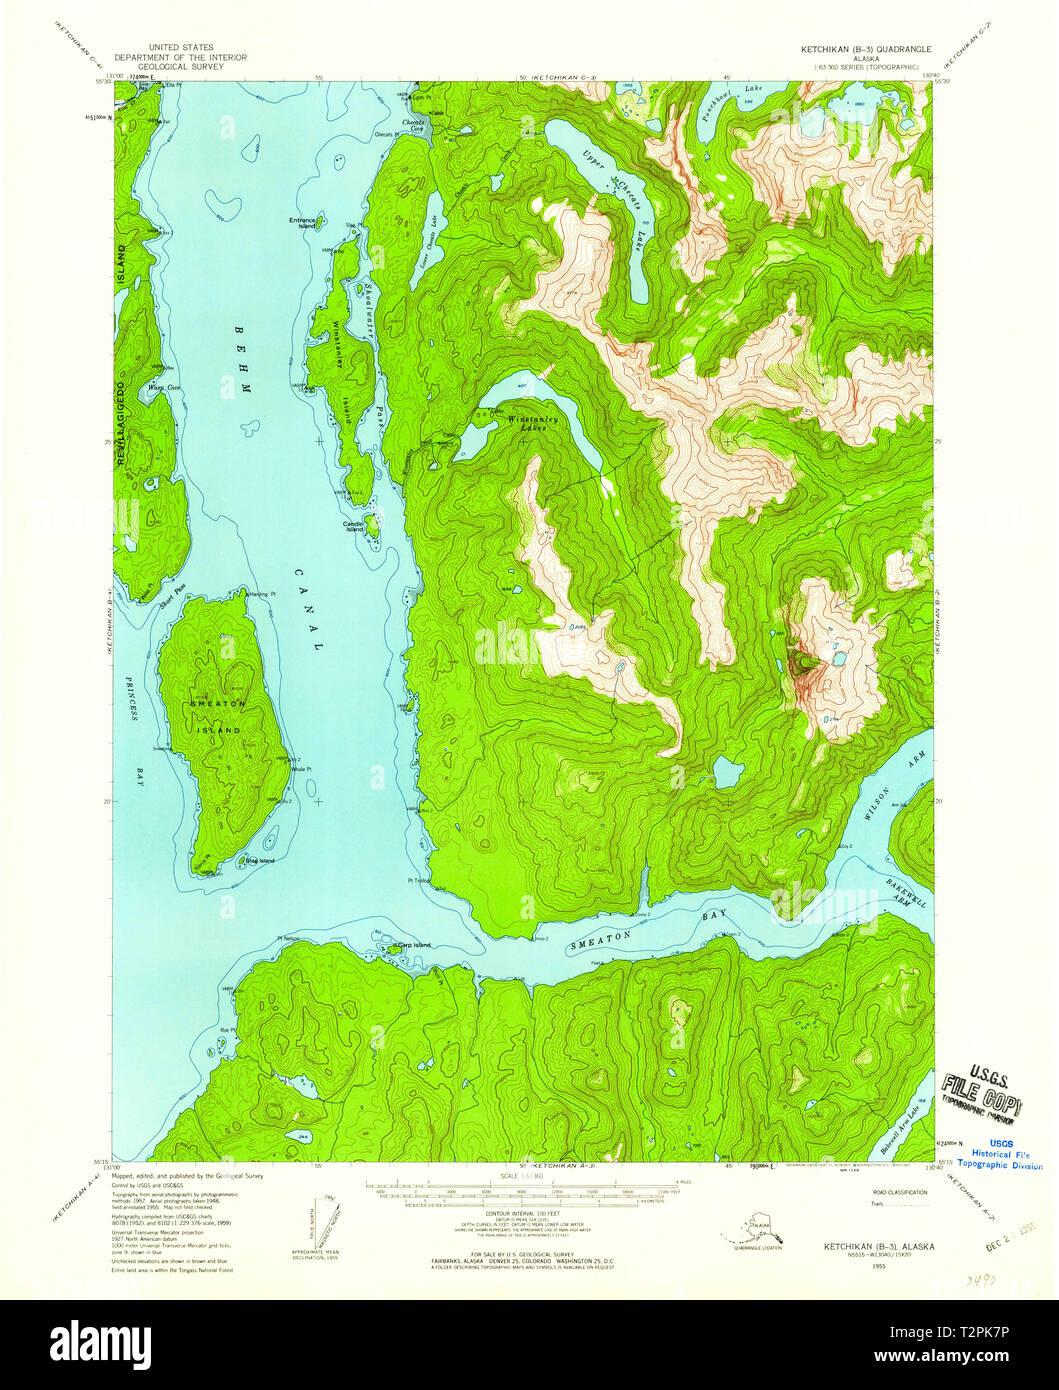 USGS TOPO Map Alaska AK Ketchikan B-3 356686 1955 63360 Restoration Ketchikan Map on sitka map, glacier bay map, chevak map, metlakatla map, skagway walking map, alaska map, superior map, juneau map, nanwalek map, anchorage map, lake and peninsula borough map, tongass national forest map, chitina map, tin city map, bethel map, kobuk map, prince william sound map, north pole map, london map, unalakleet map,